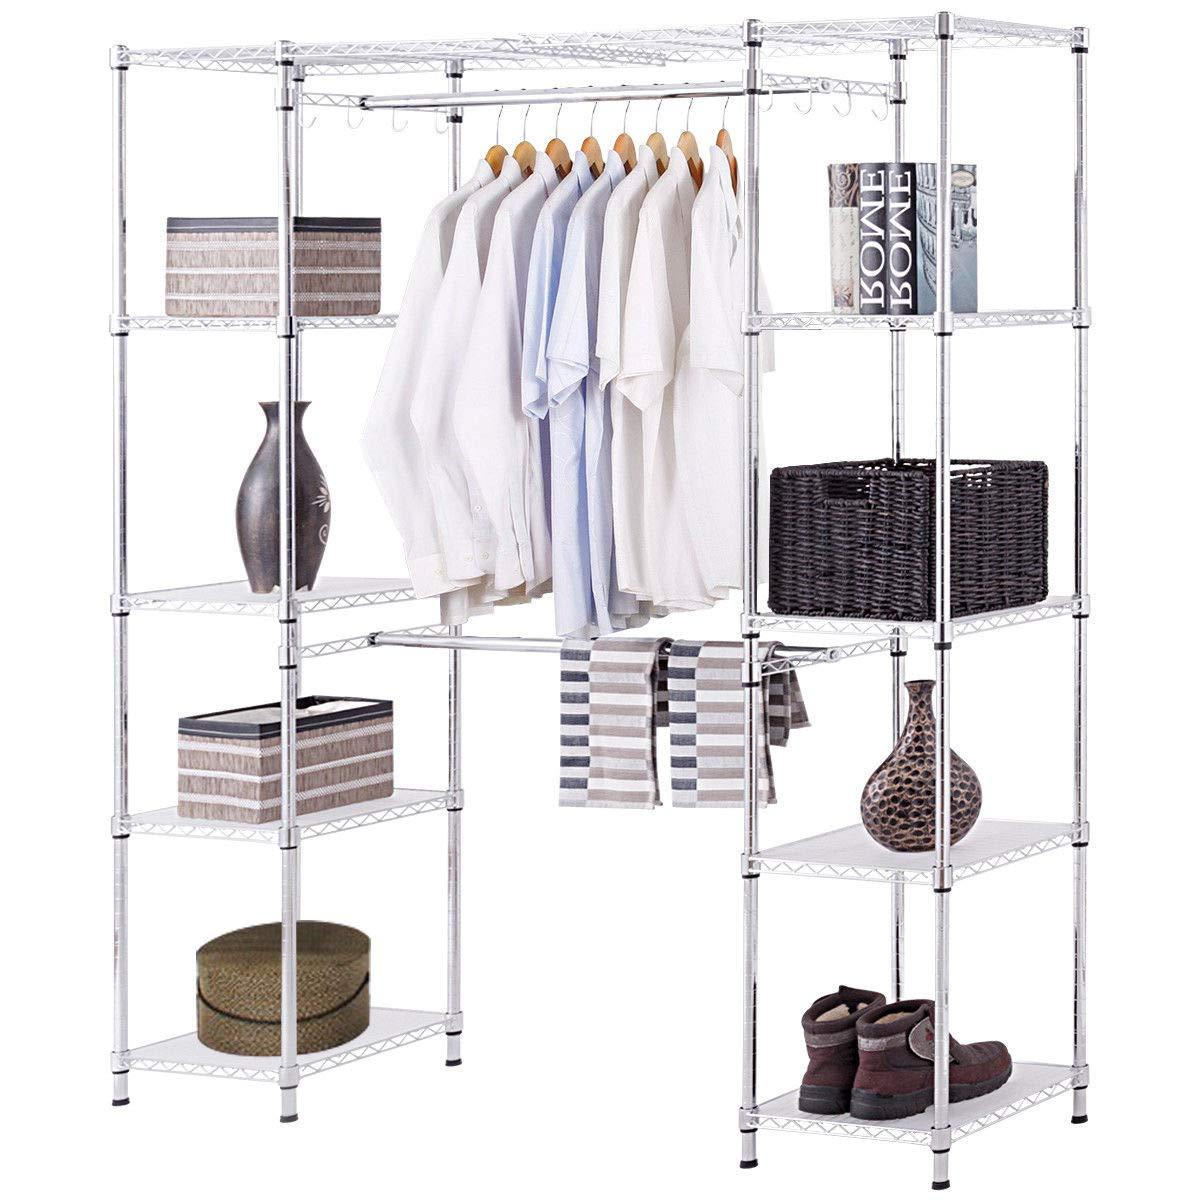 Tangkula Garment Rack Portable Adjustable Expandable Closet Storage  Organizer System Home Bedroom Closet Shelves Clothes Wardrobe (Silver)